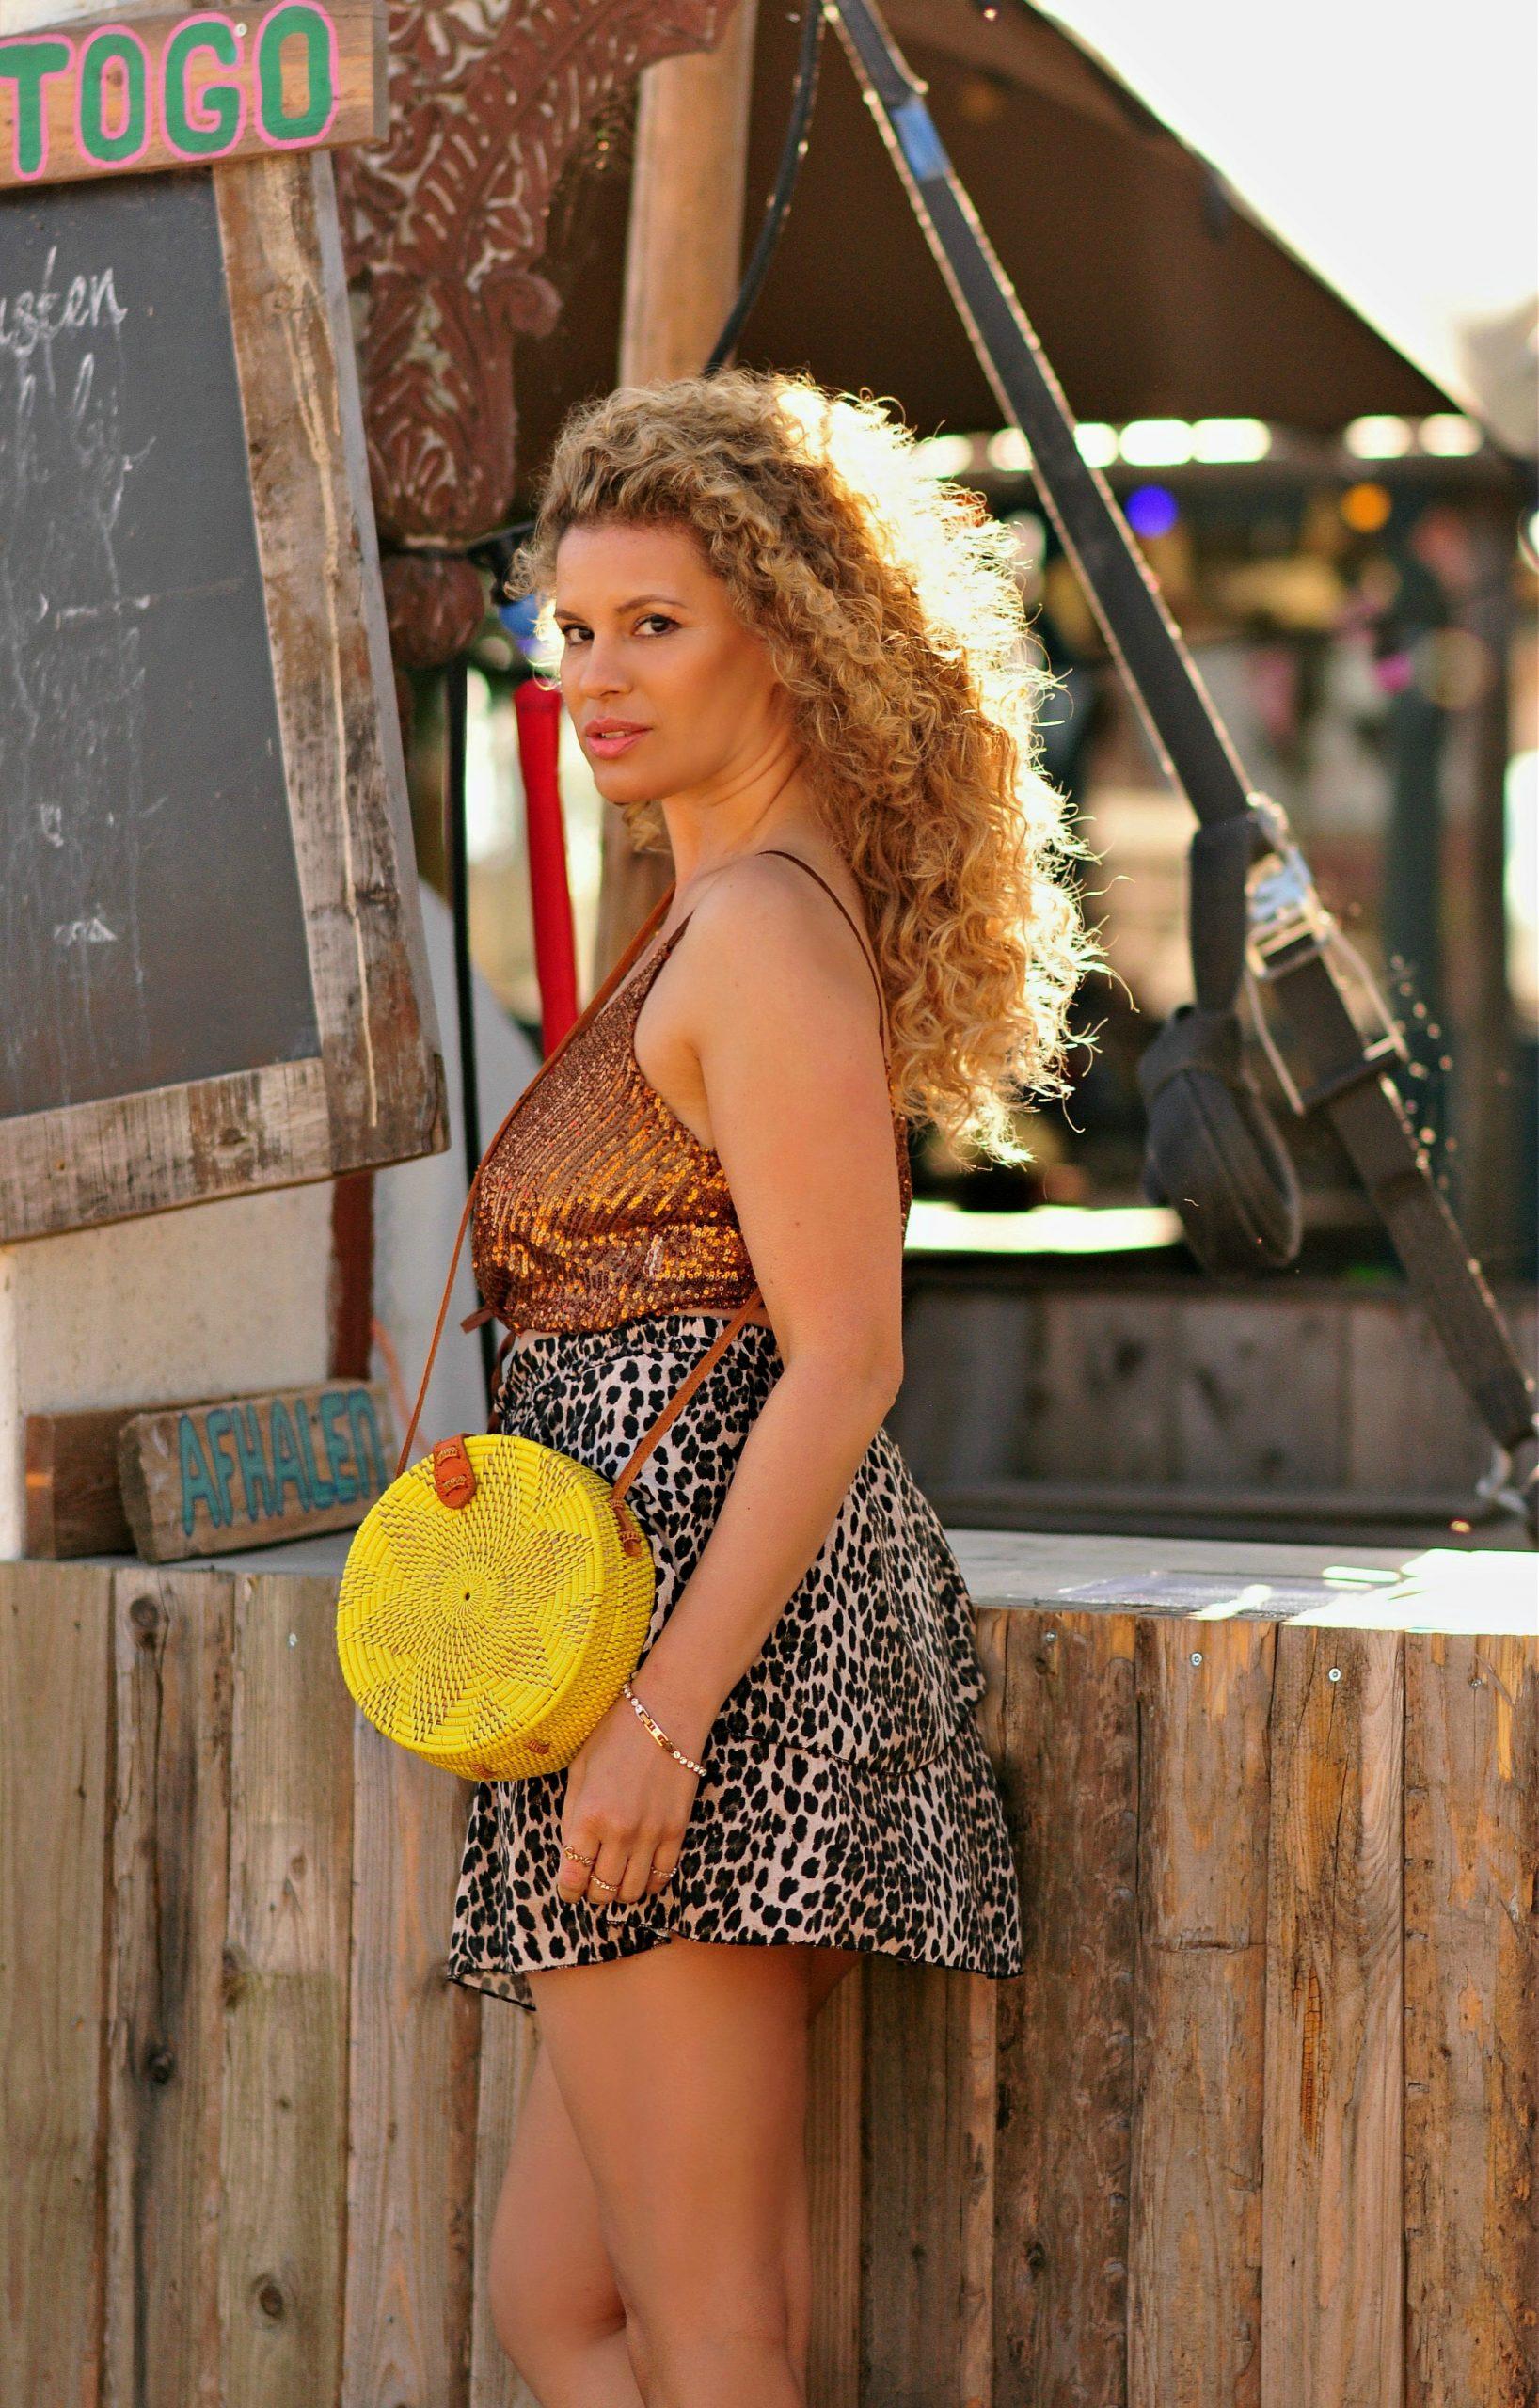 Tamara Chloé, Yellow Bali bag, Lola land, Blijburg3+2